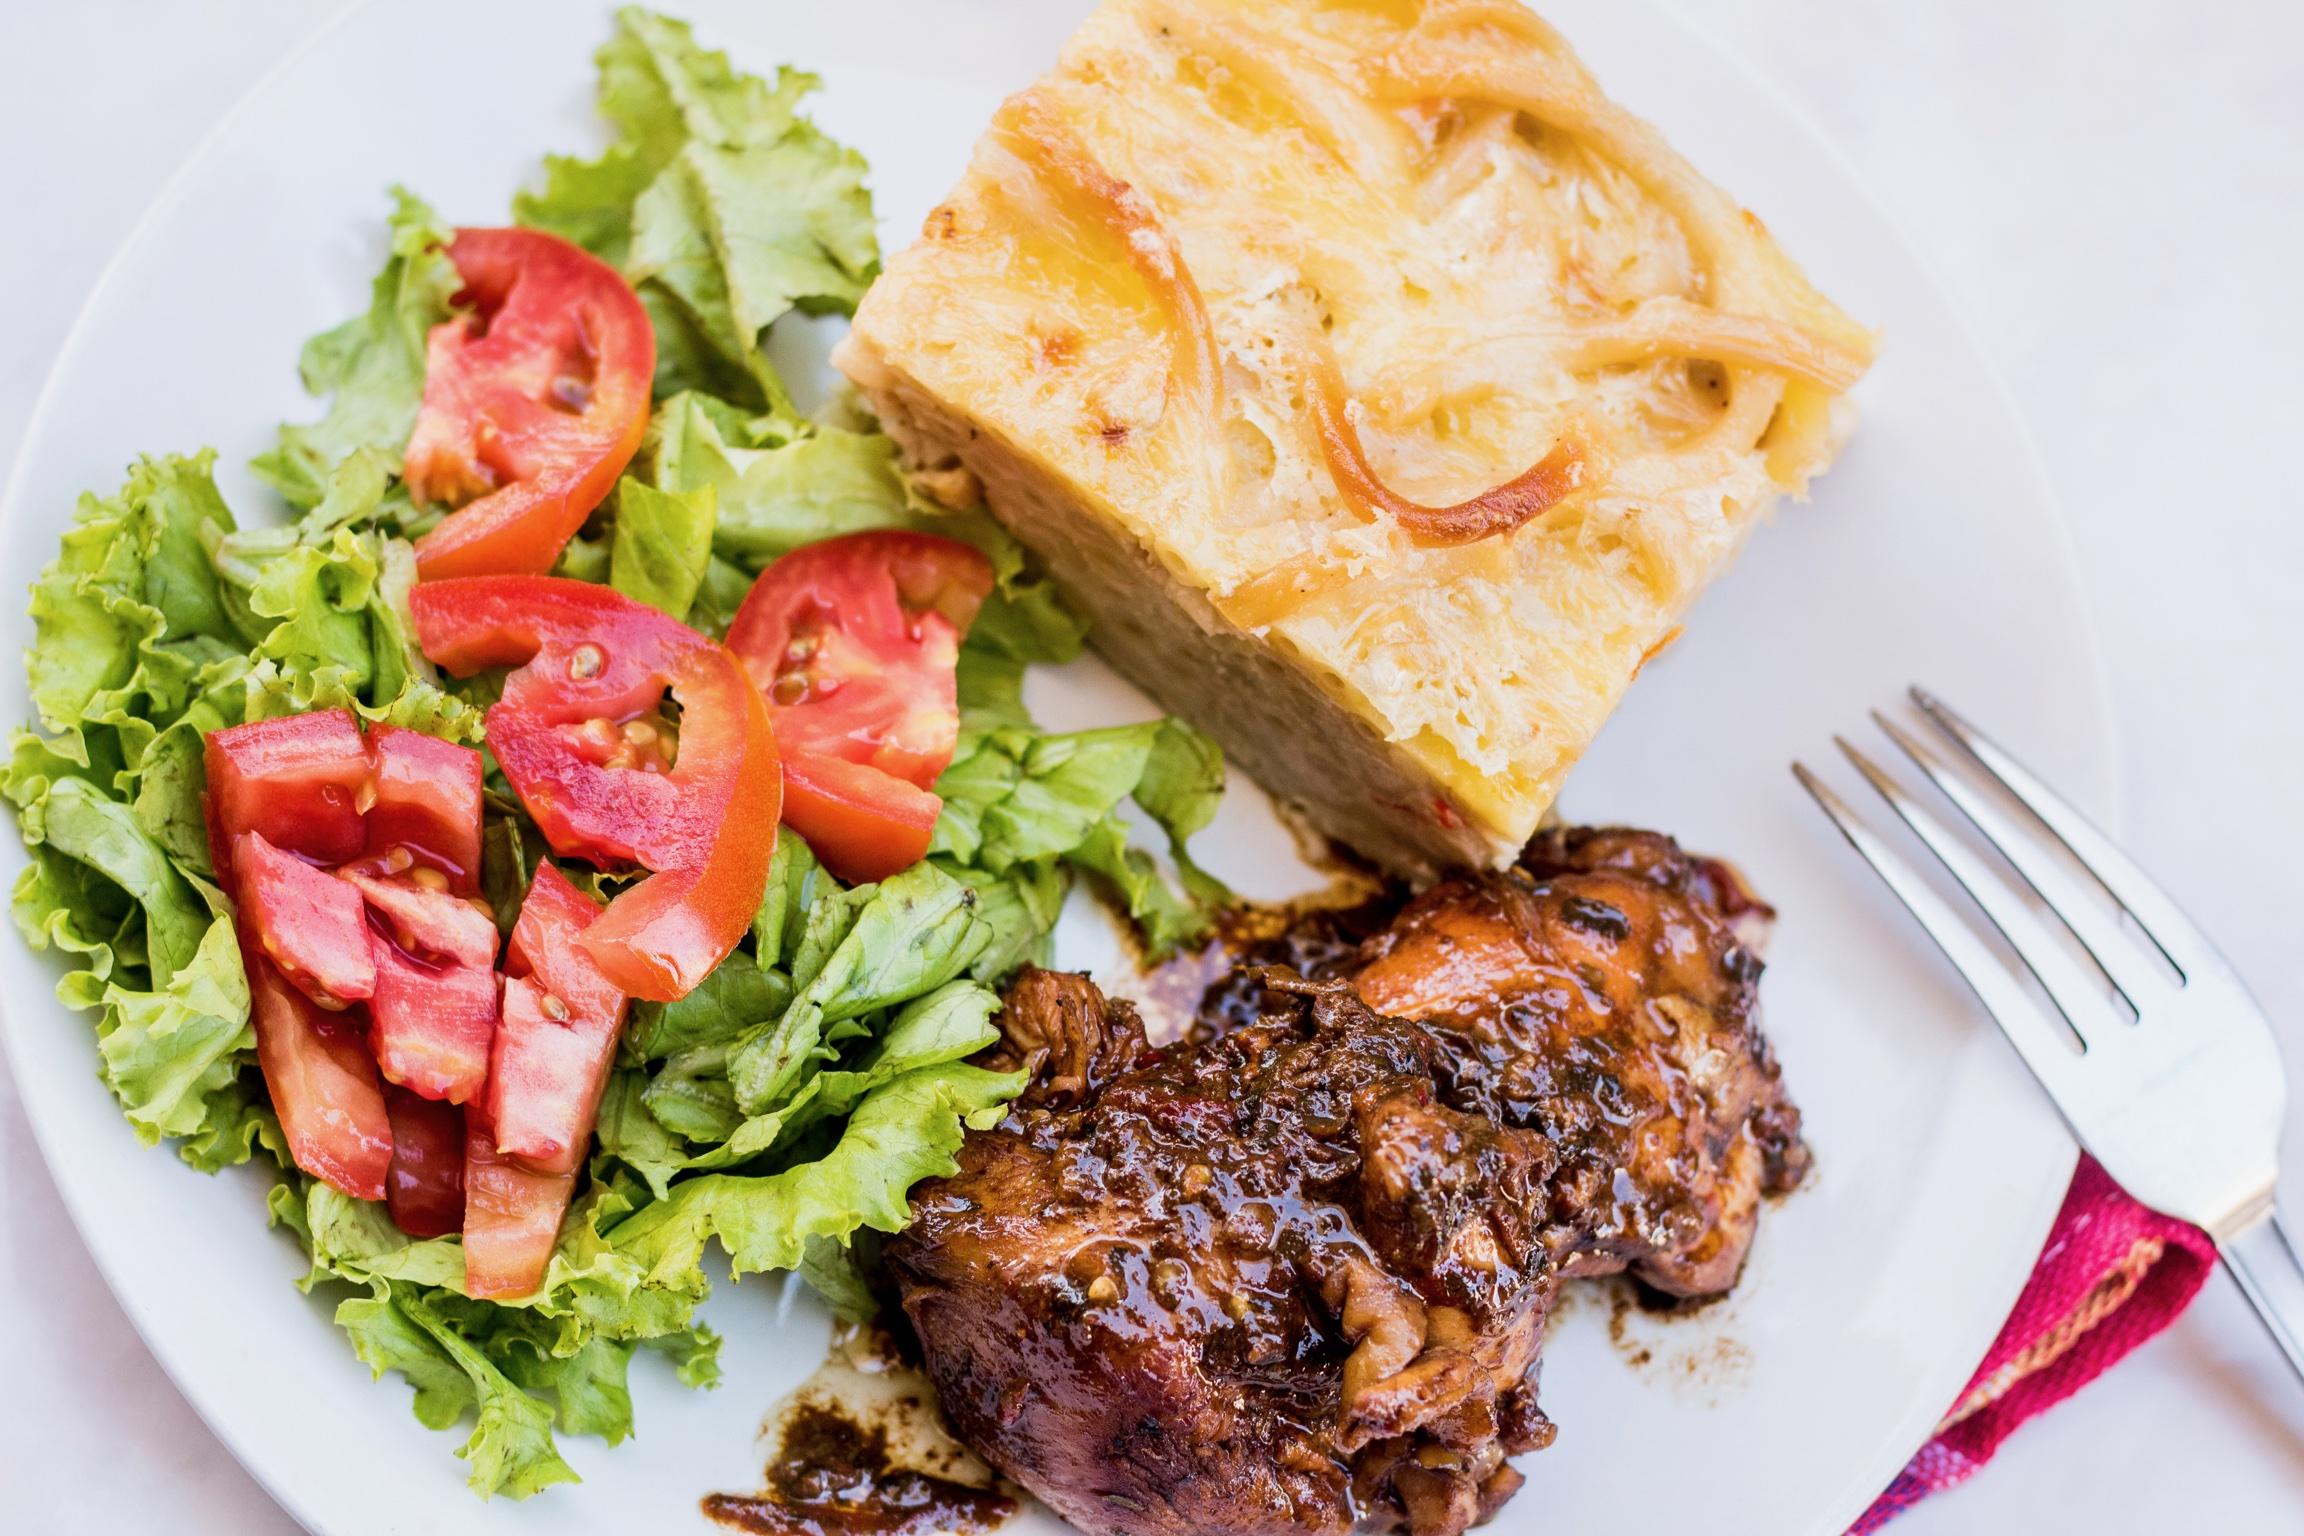 Classic Caribbean Sunday Lunch Staples